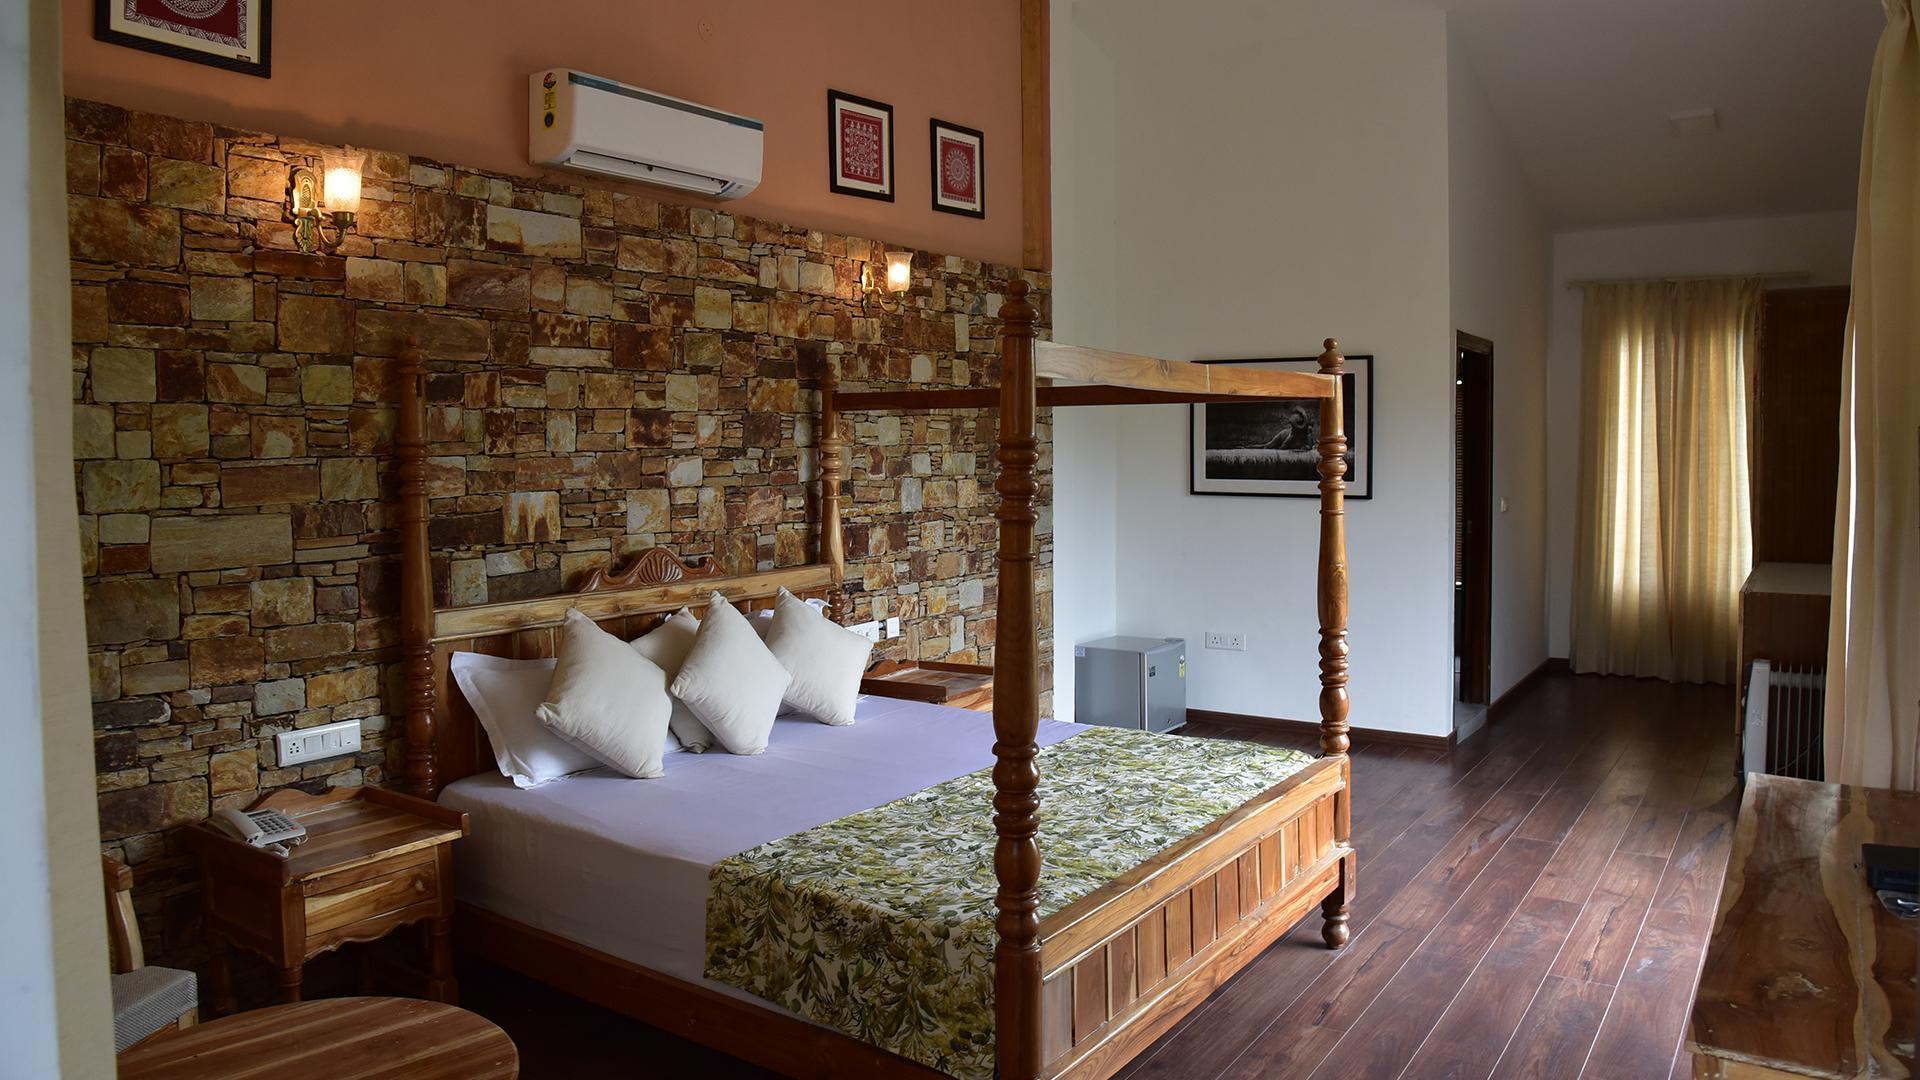 Premium Hideaway Room image 1 at Tree of Life Vanvilas Riveredge, Corbett National Park by Nainital, Uttarakhand, India